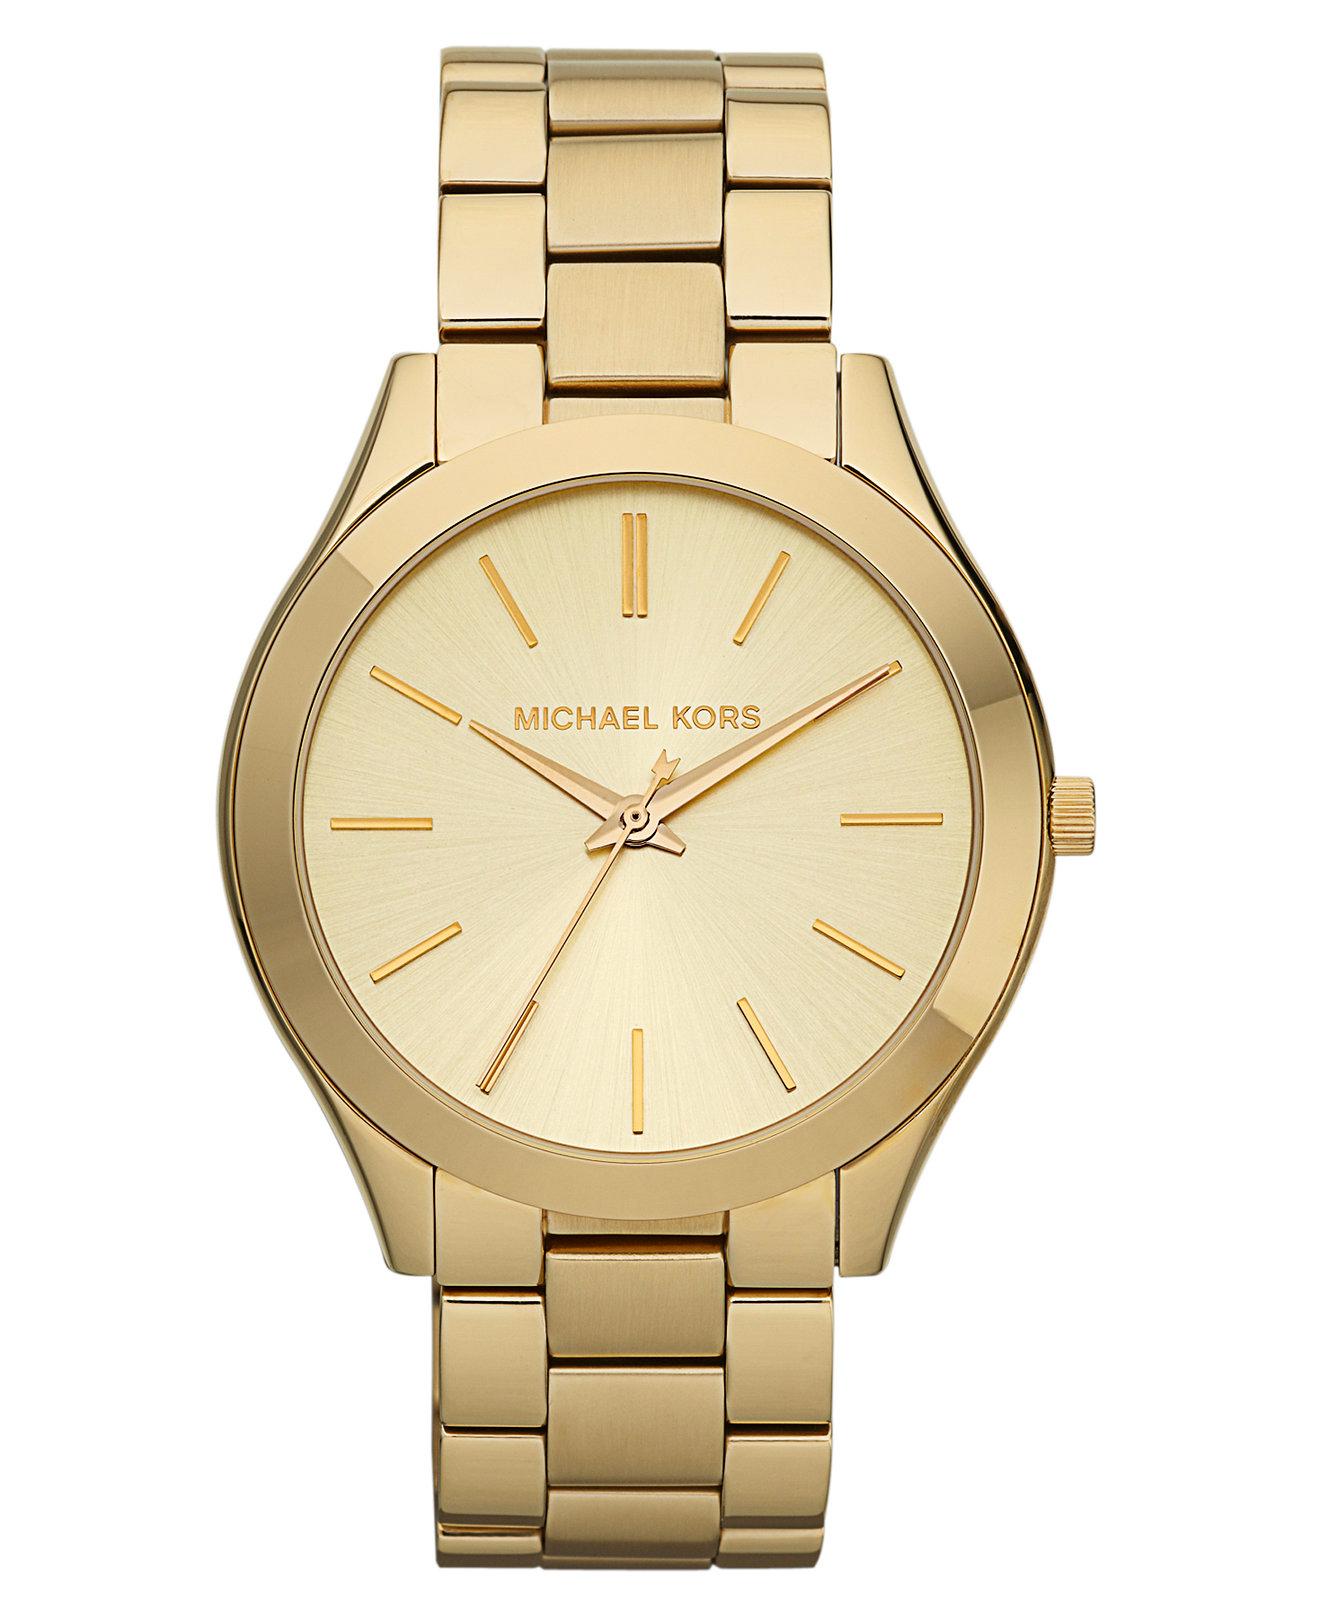 264e9b7c8b90e Michael Kors Watches | Luxury Watches for Men and Women